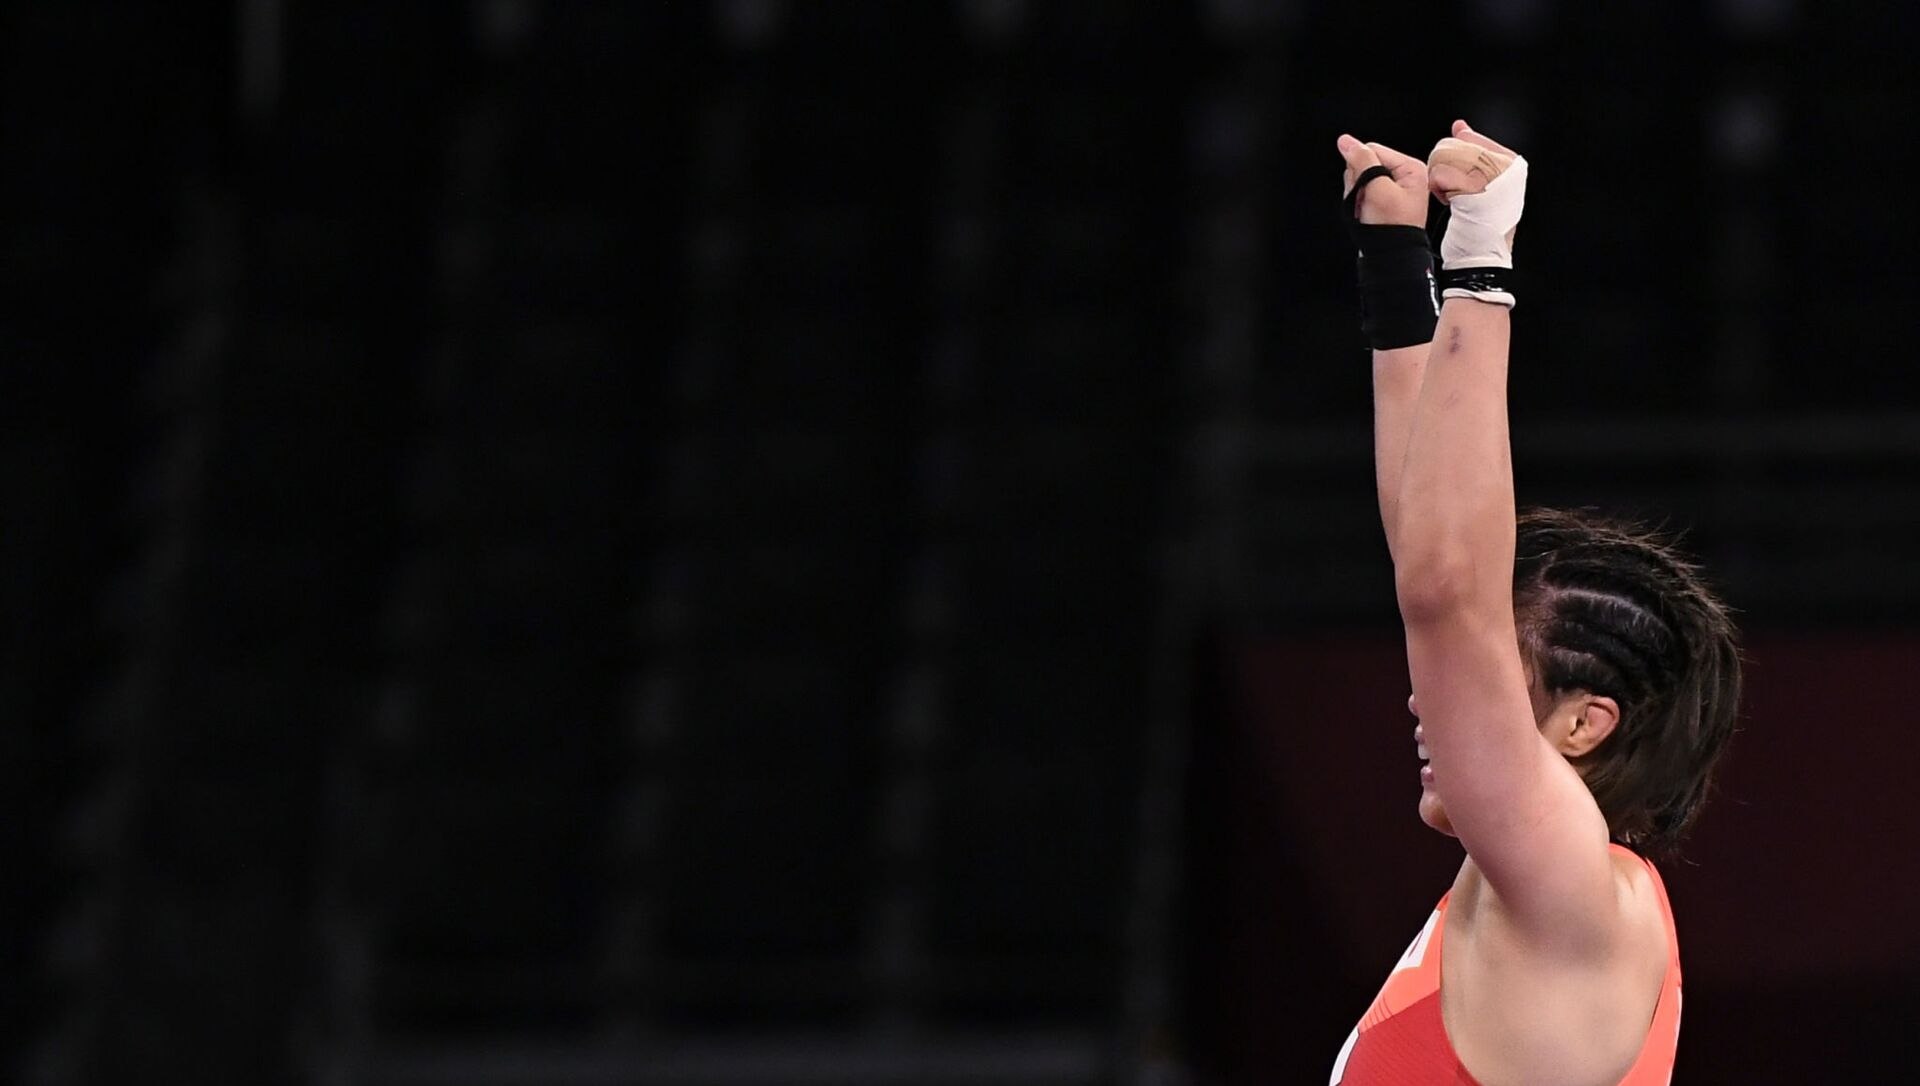 Risako Kawai of Japan celebrates after winning gold against Iryna Kurachkina of Belarus. - Sputnik International, 1920, 05.08.2021